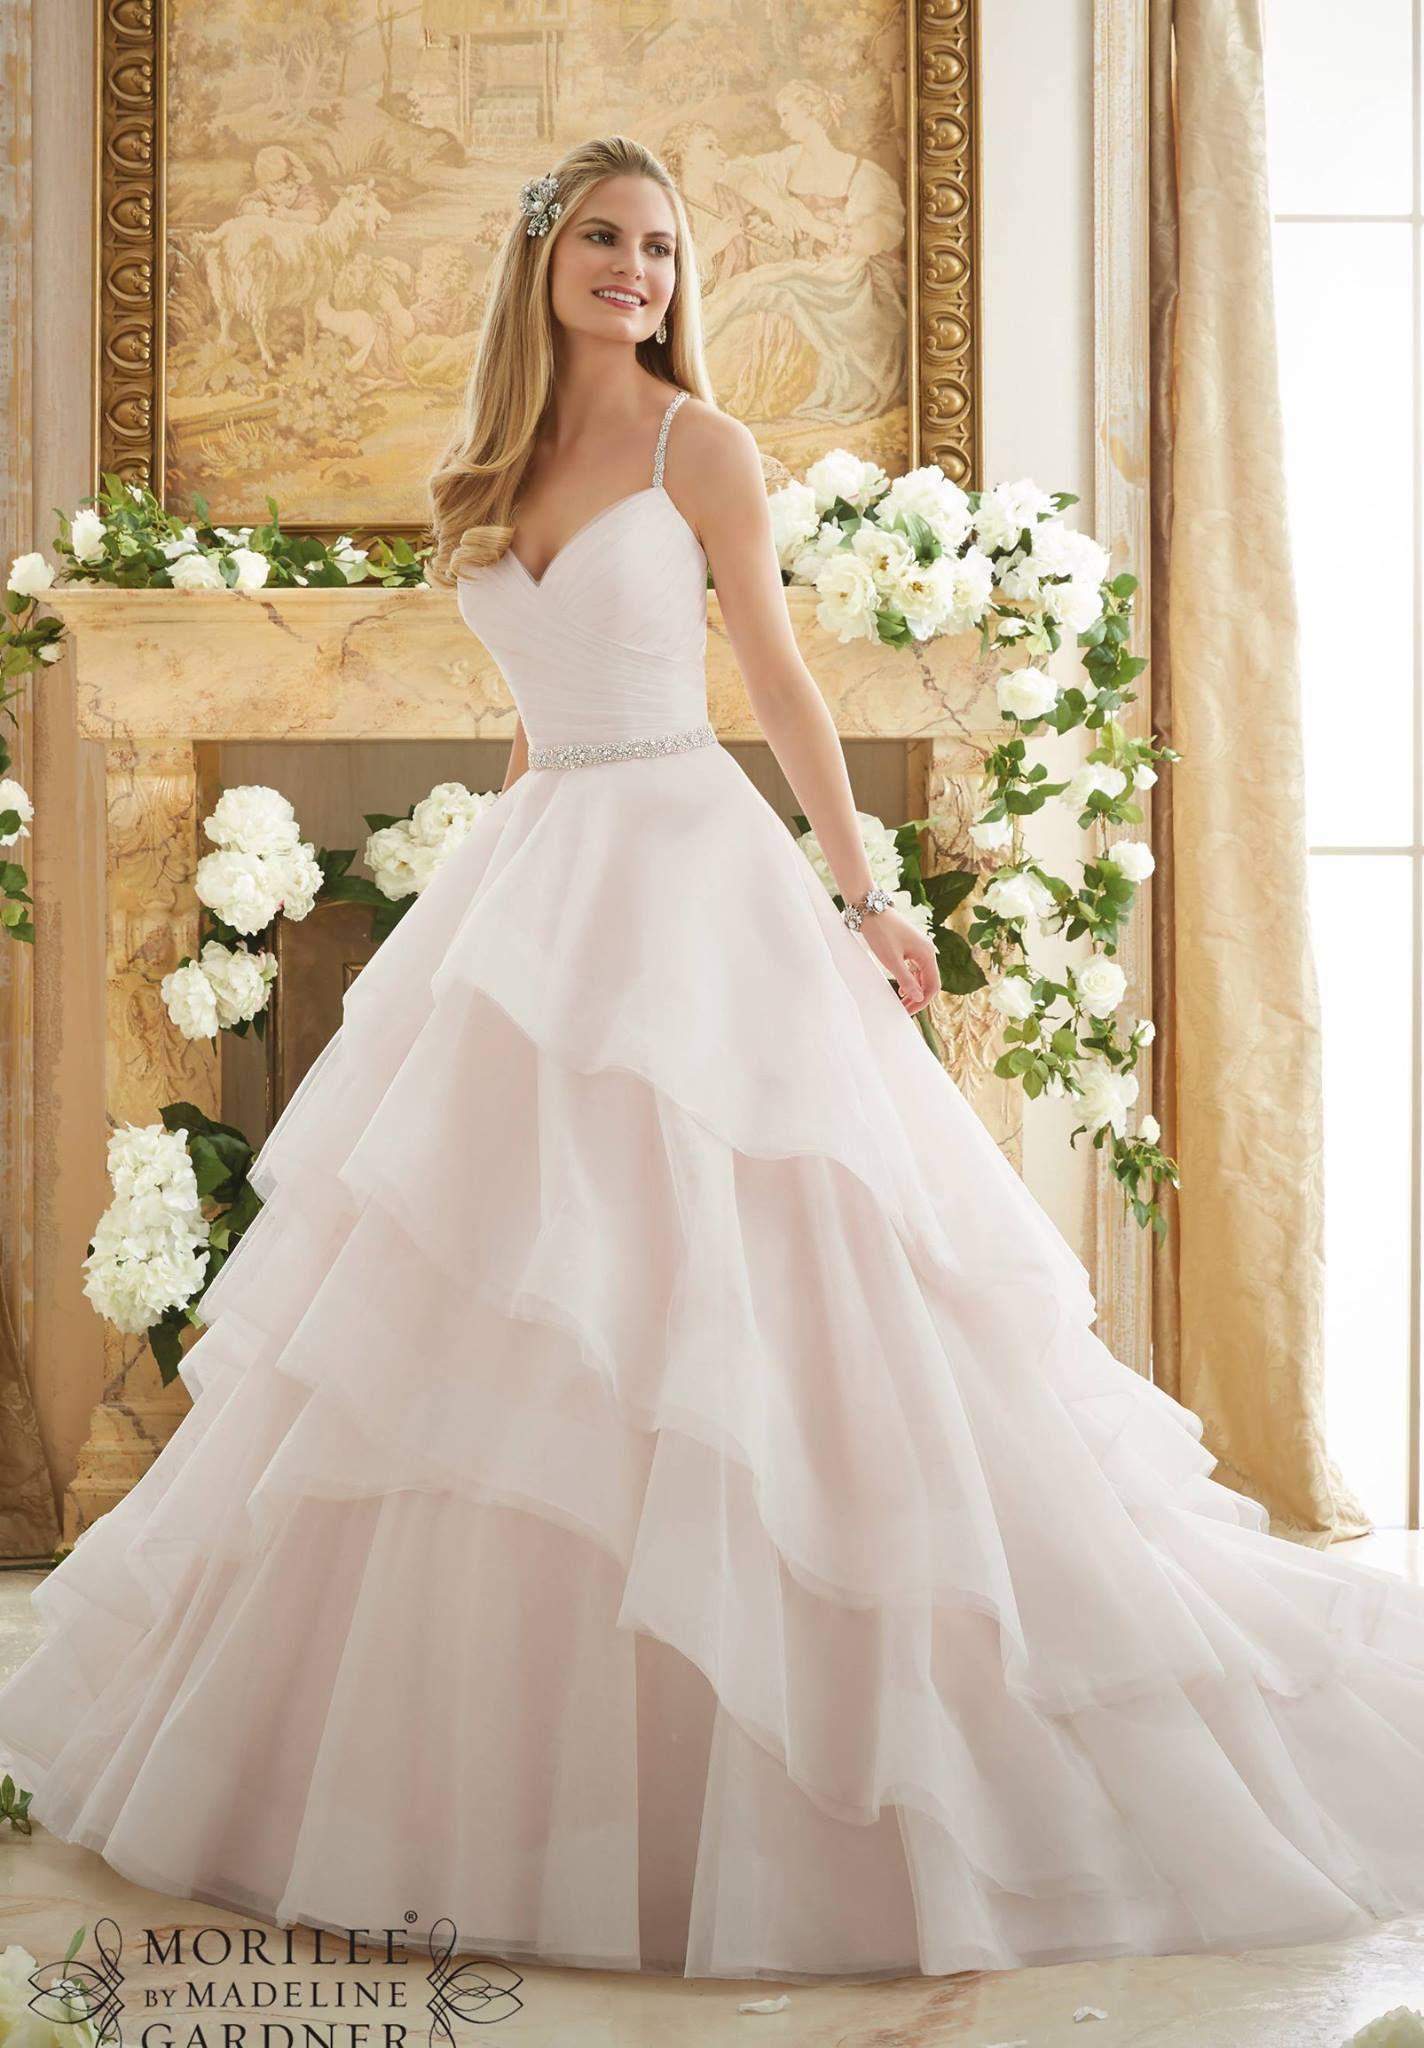 149 Vestidos De Noivas Lindos 2018 Wedding Stuff Wedding Dresses